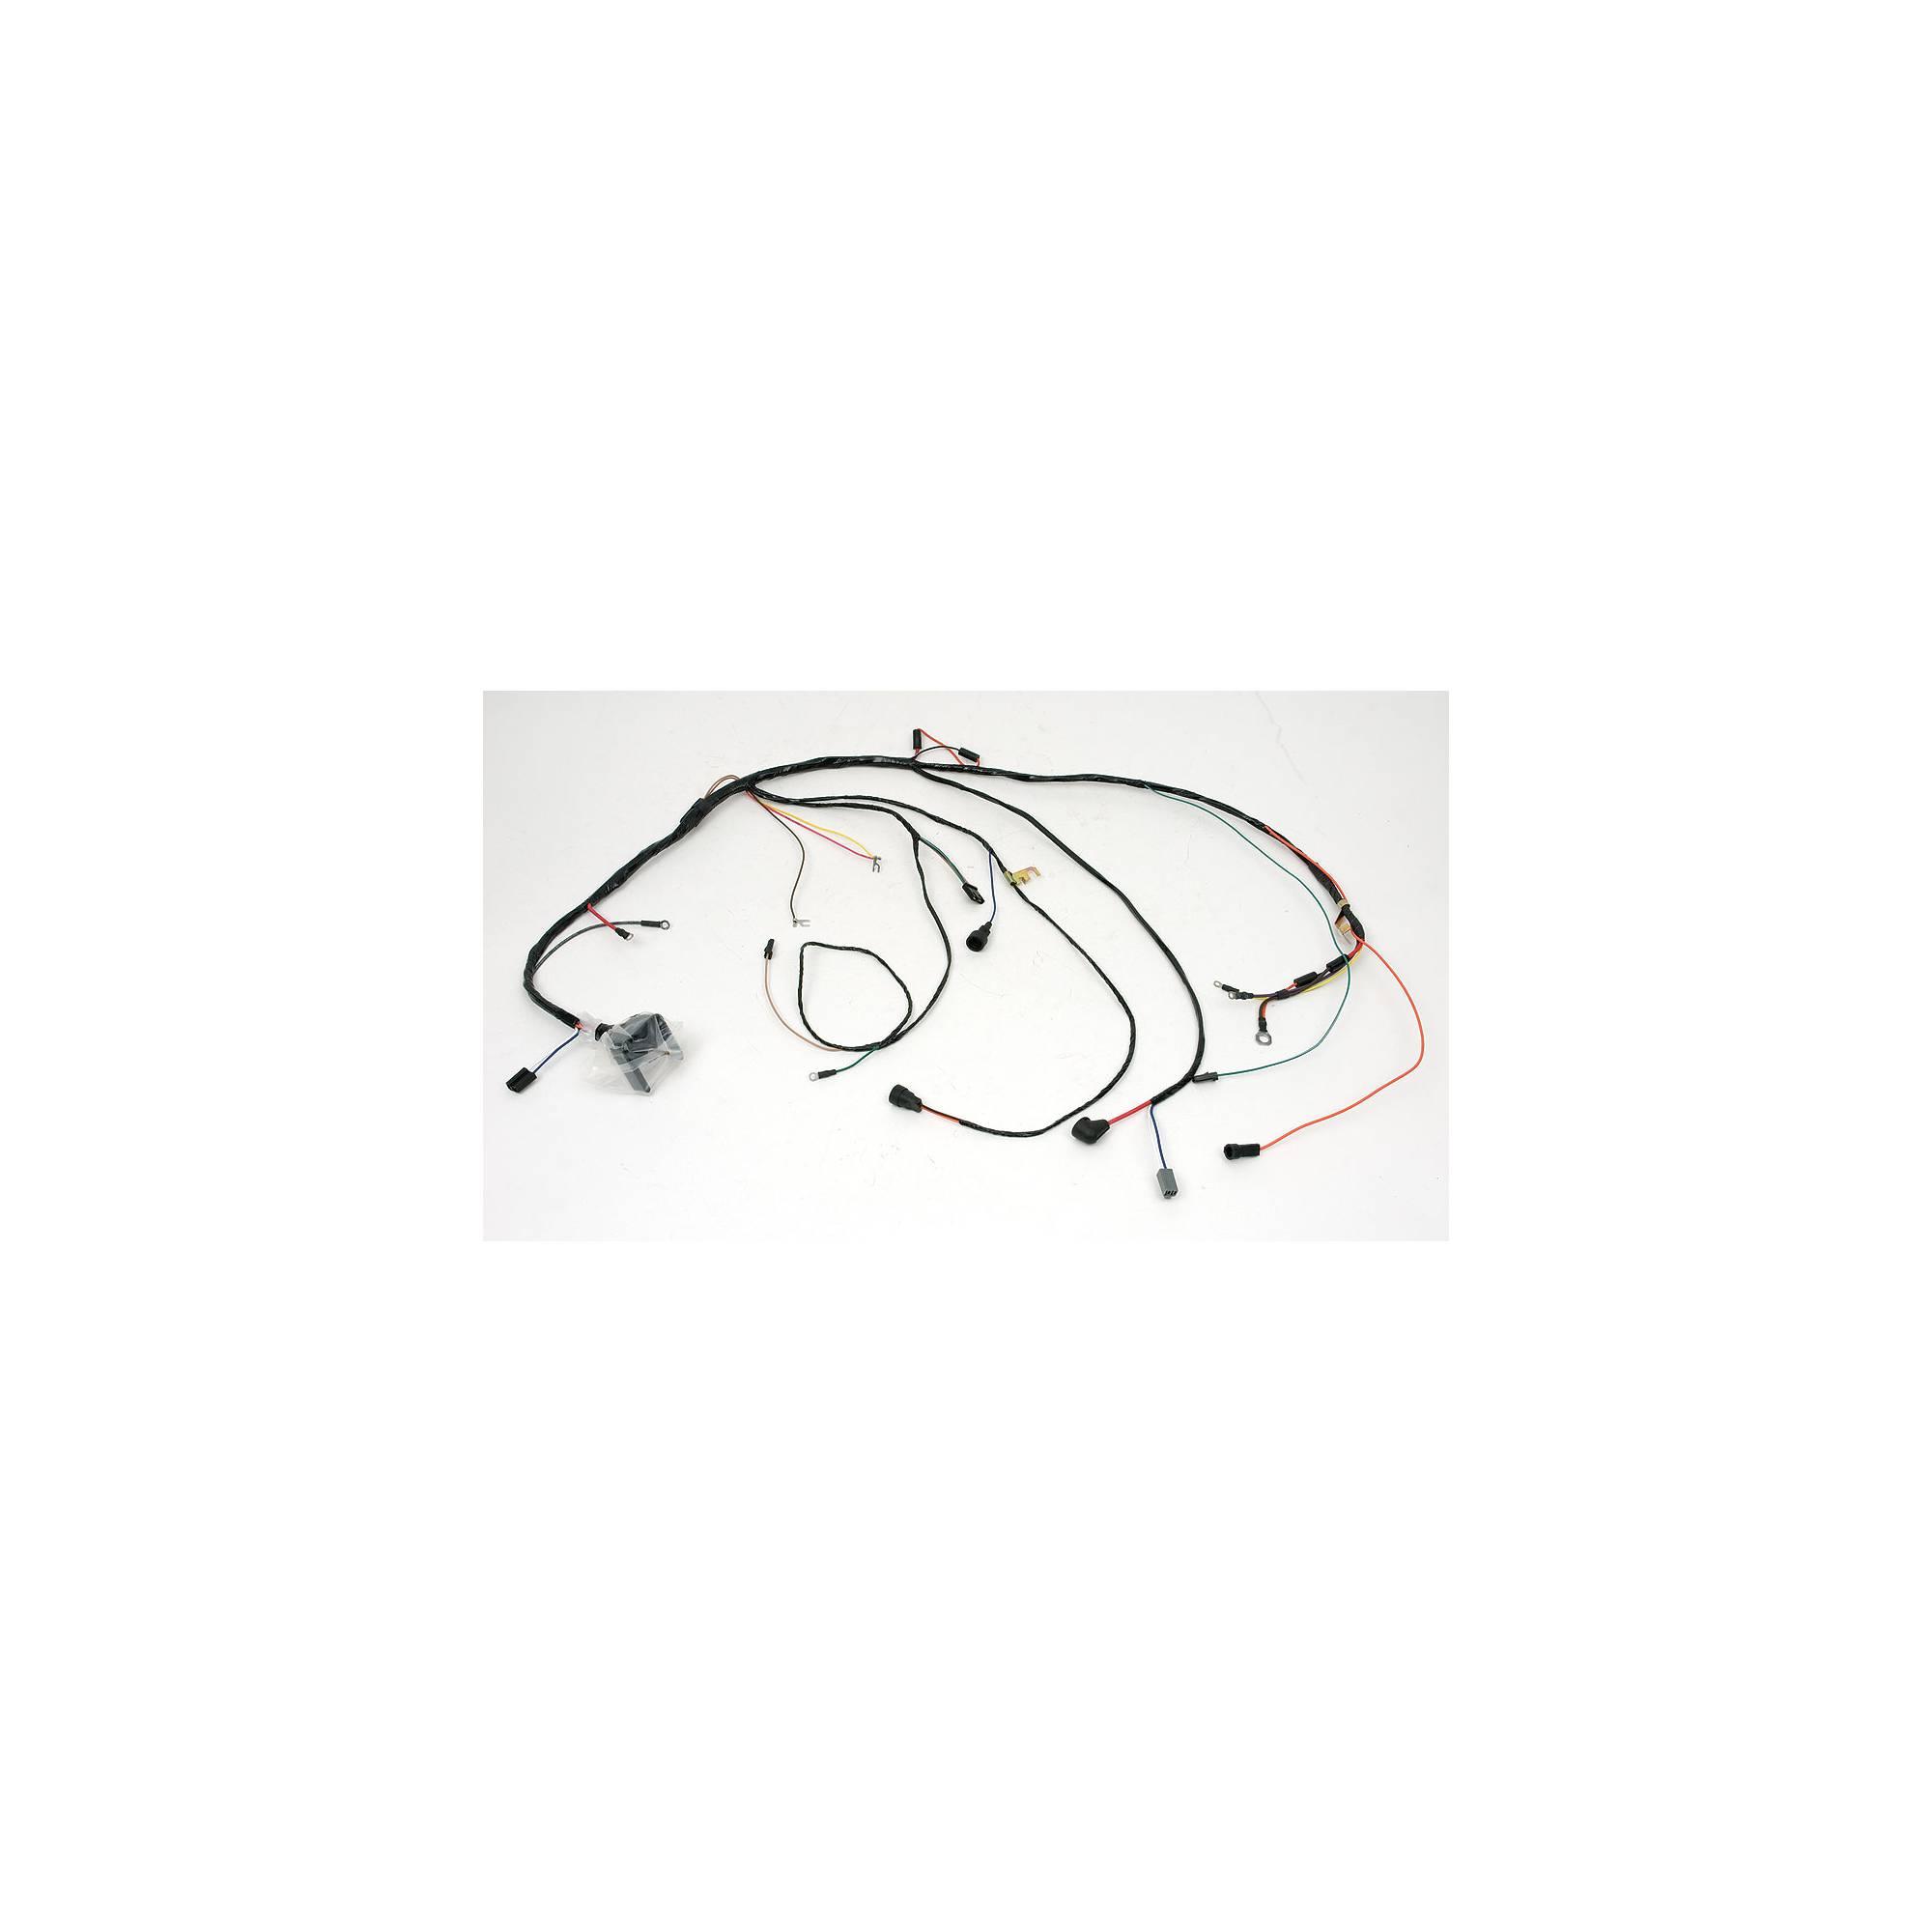 Eckler's Premier Products 50-203898 Chevelle Engine Wiring